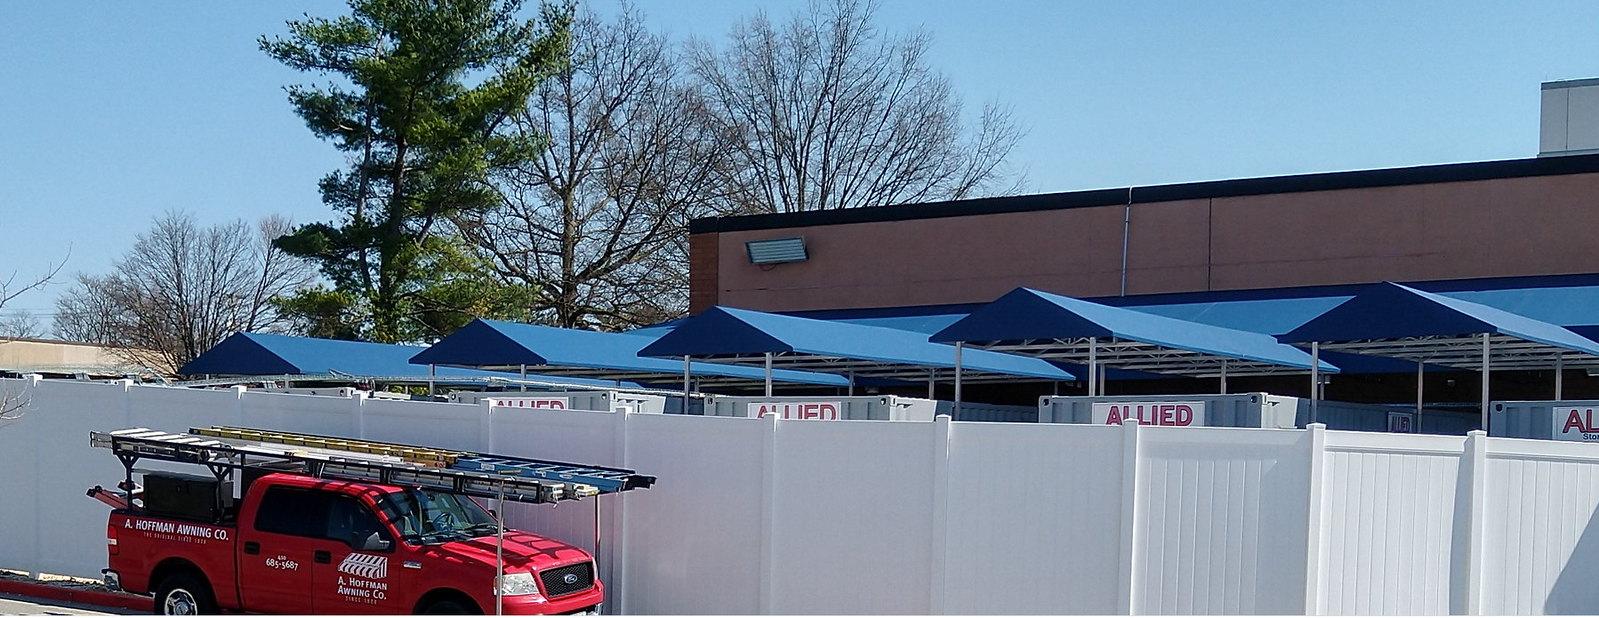 McKormicks Large Canopy Project